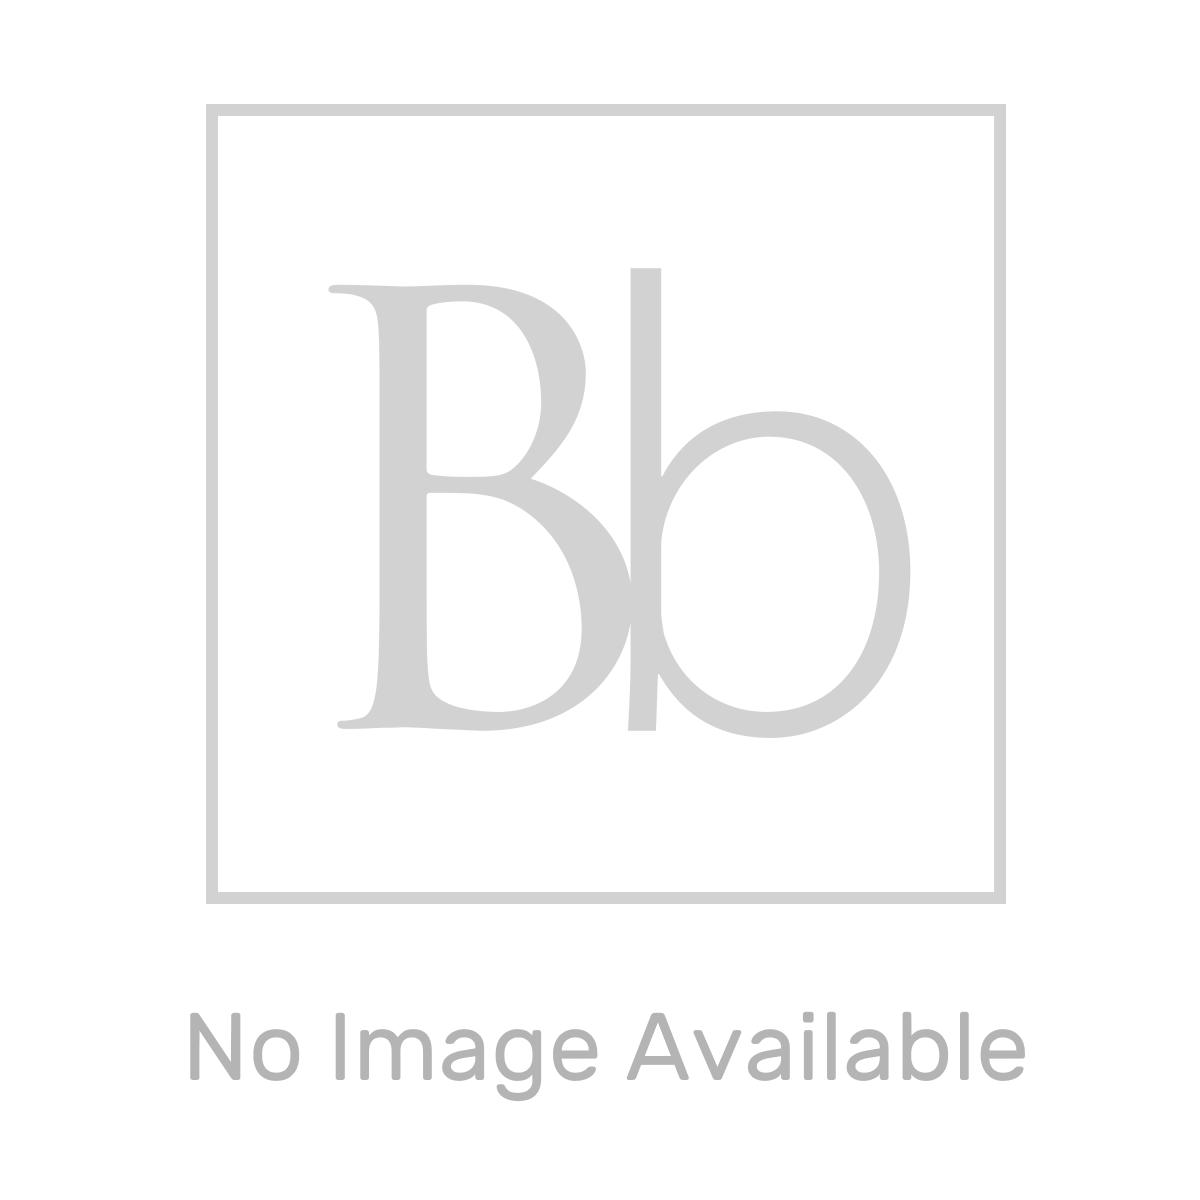 RAK Resort En-Suite with Offset Quadrant Shower Enclosure